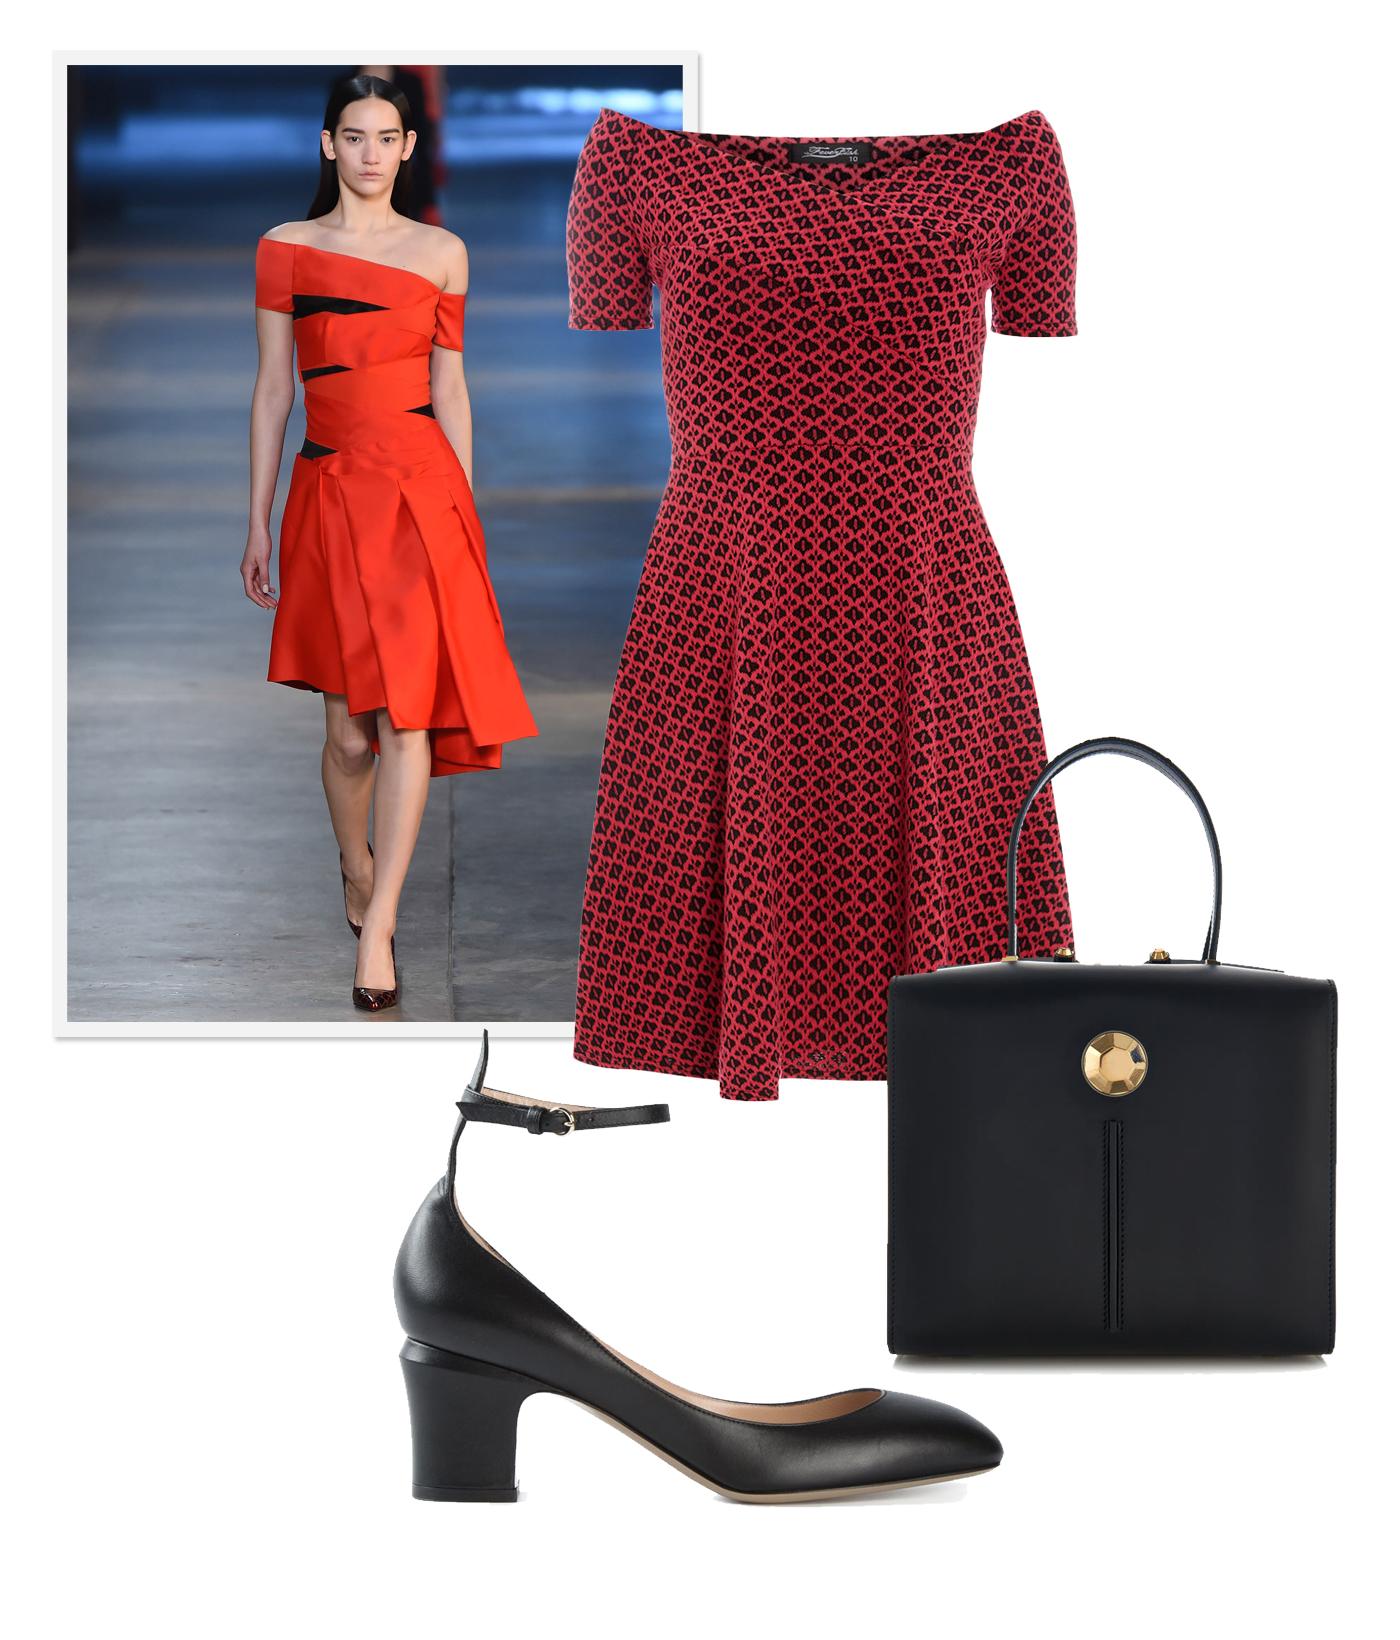 fall-2015-trends-shopping-06.jpg